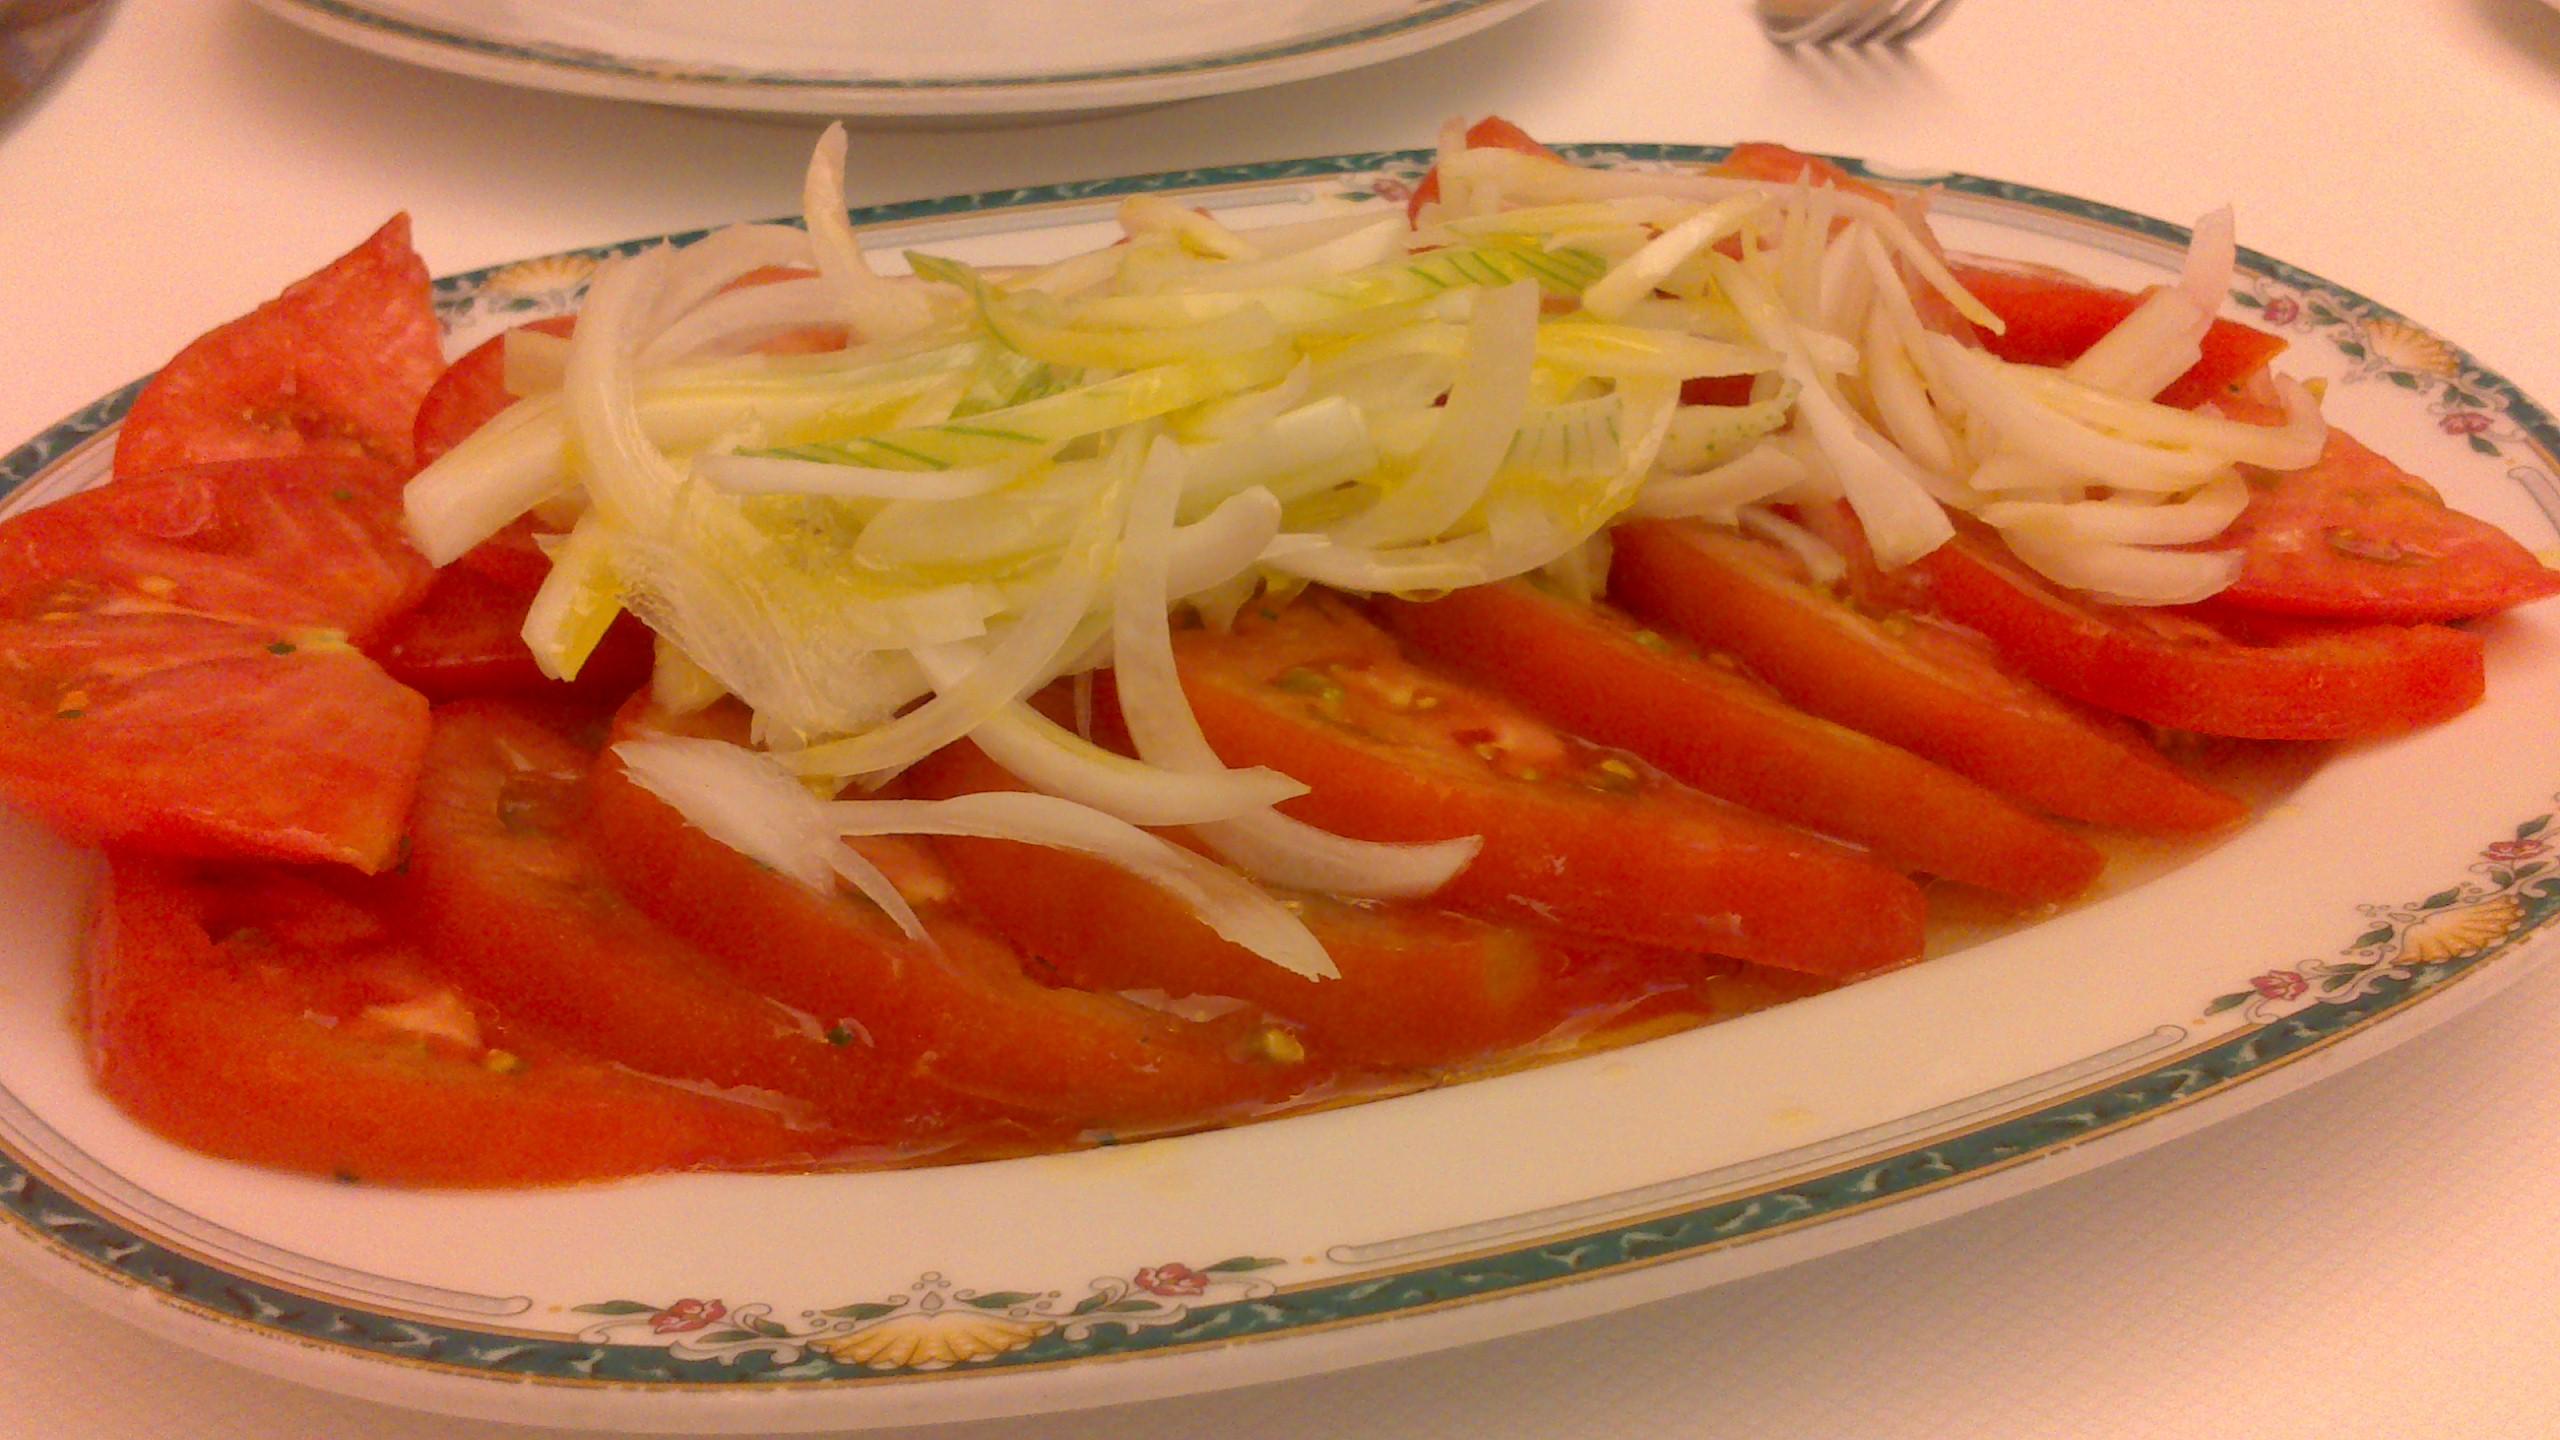 Restaurante en Bilbao Ensalada de tomate